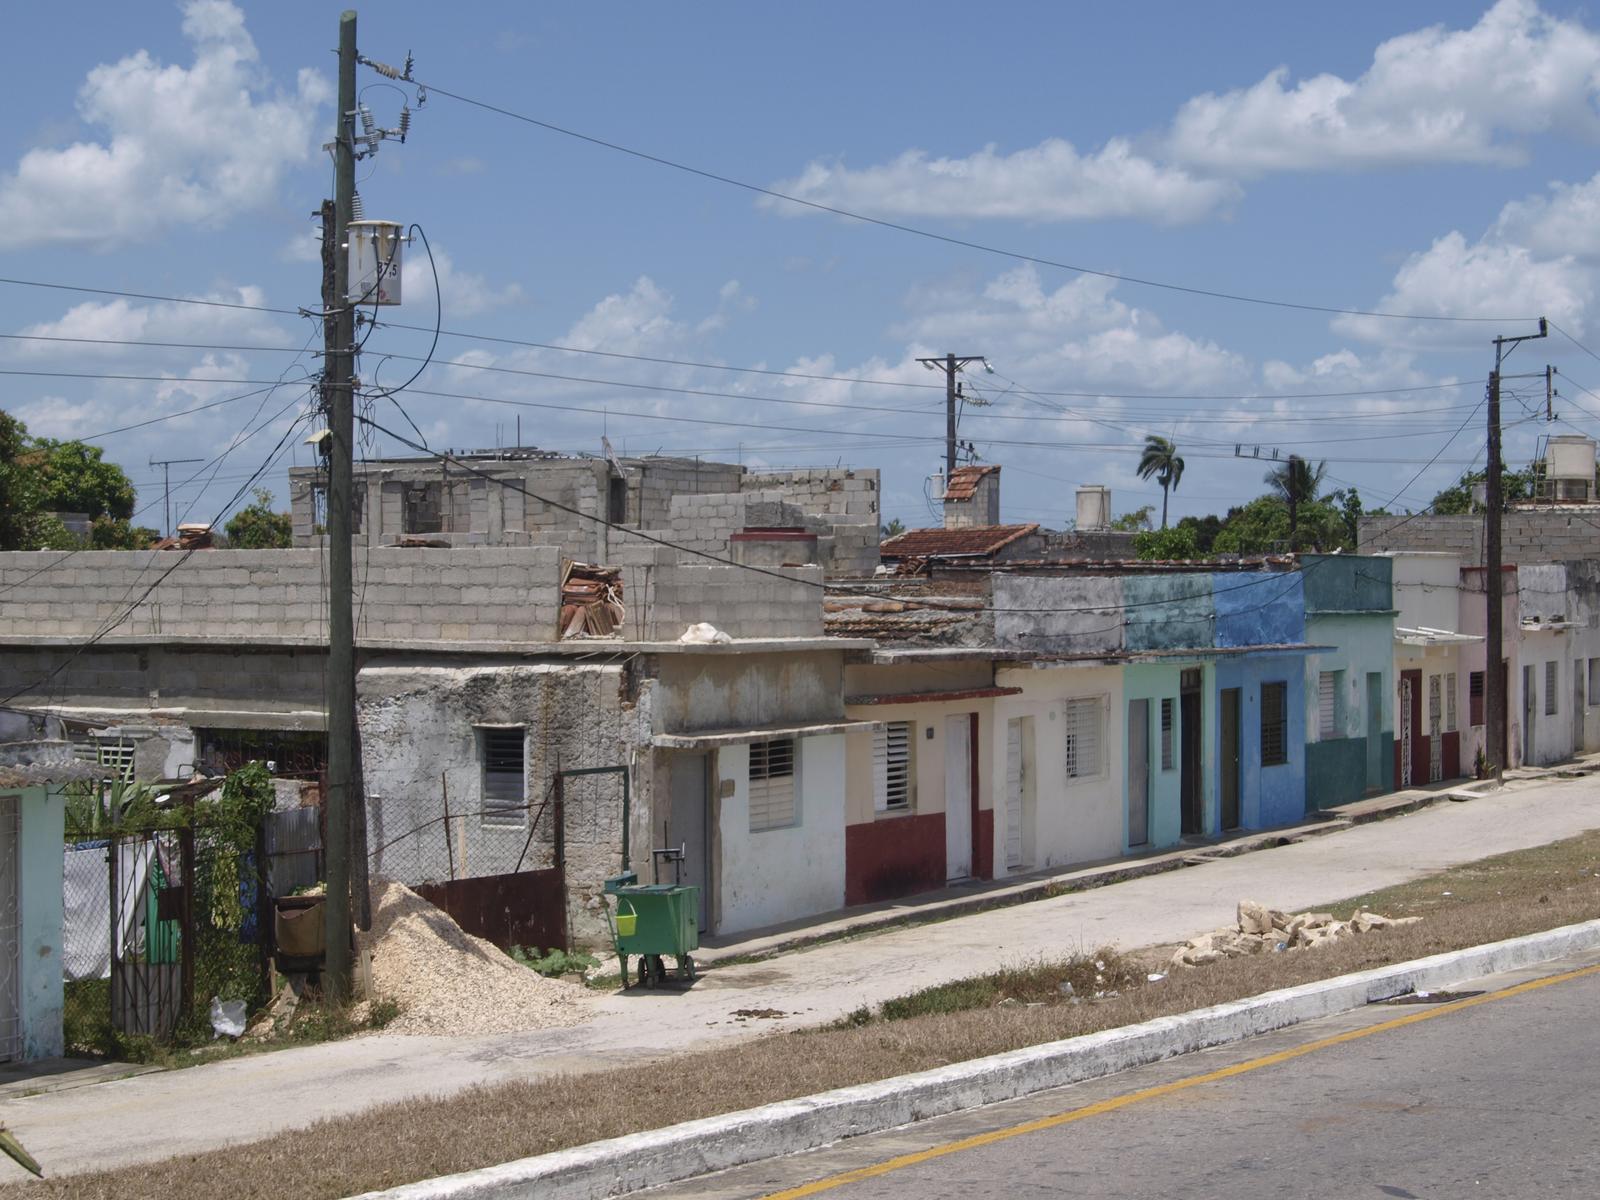 Kuba architektúra - dediny